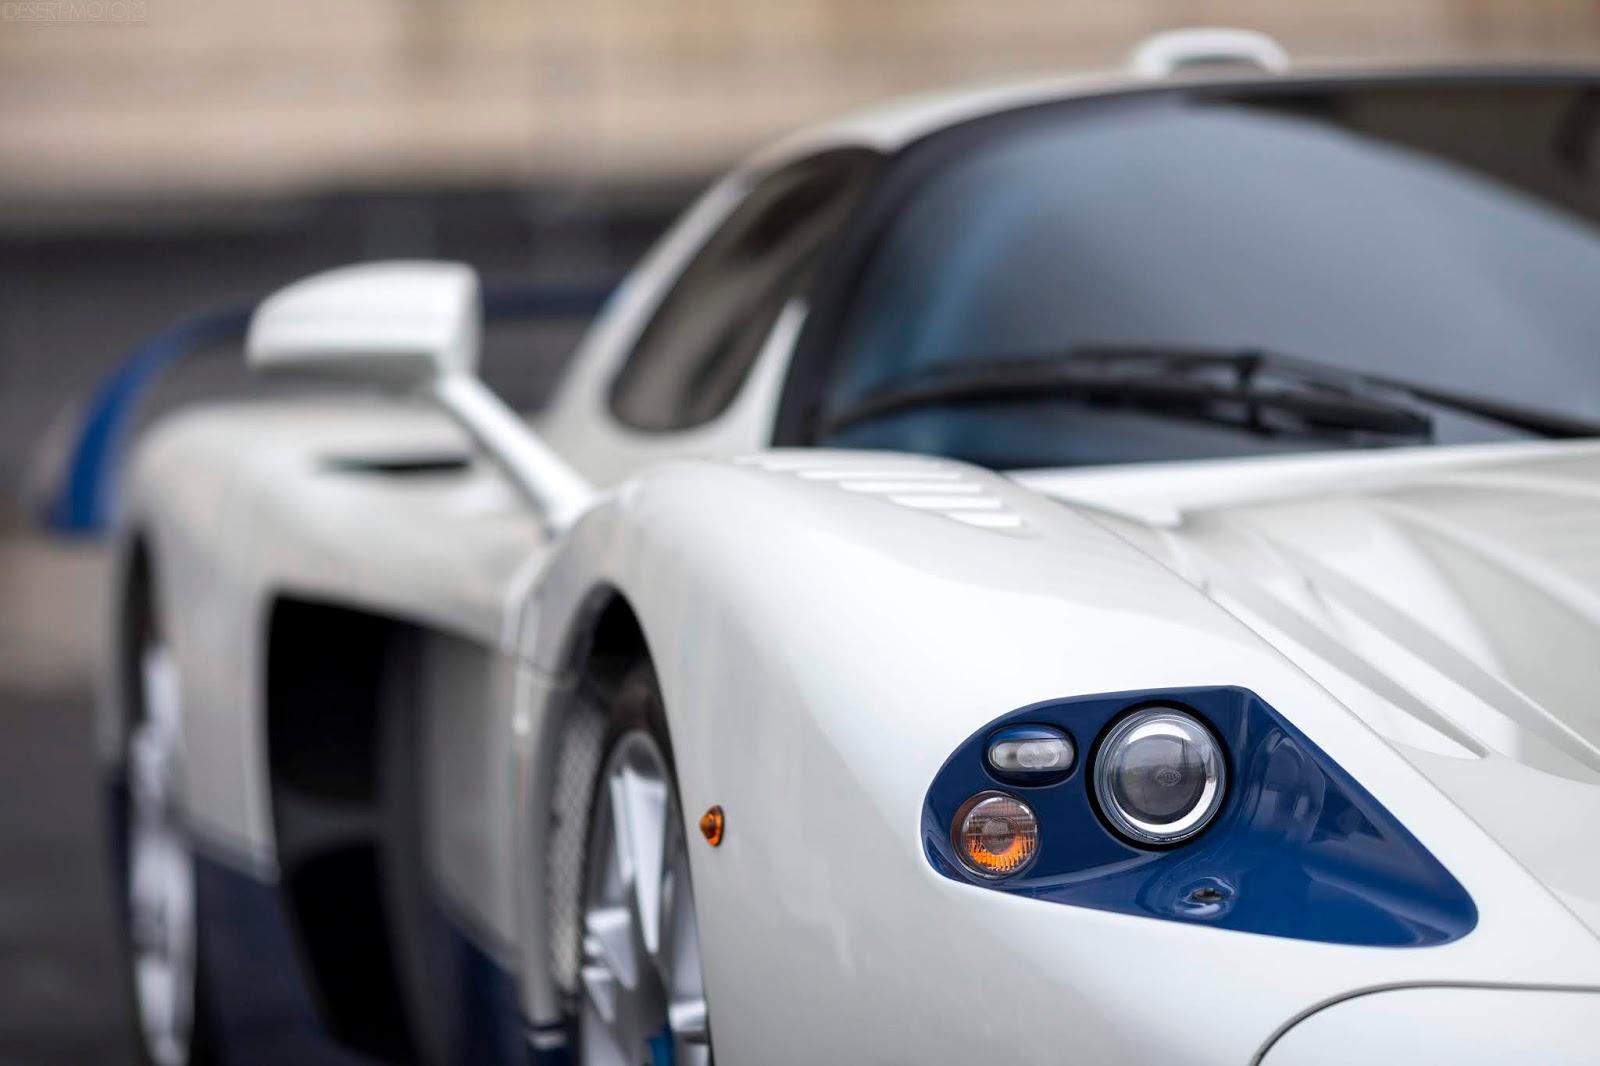 30429808966 46eda64437 o Maserati MC12. Η Enzo Aperta. Maserati, Maserati MC12, MC12, retrocar, retrocar sunday, zblog